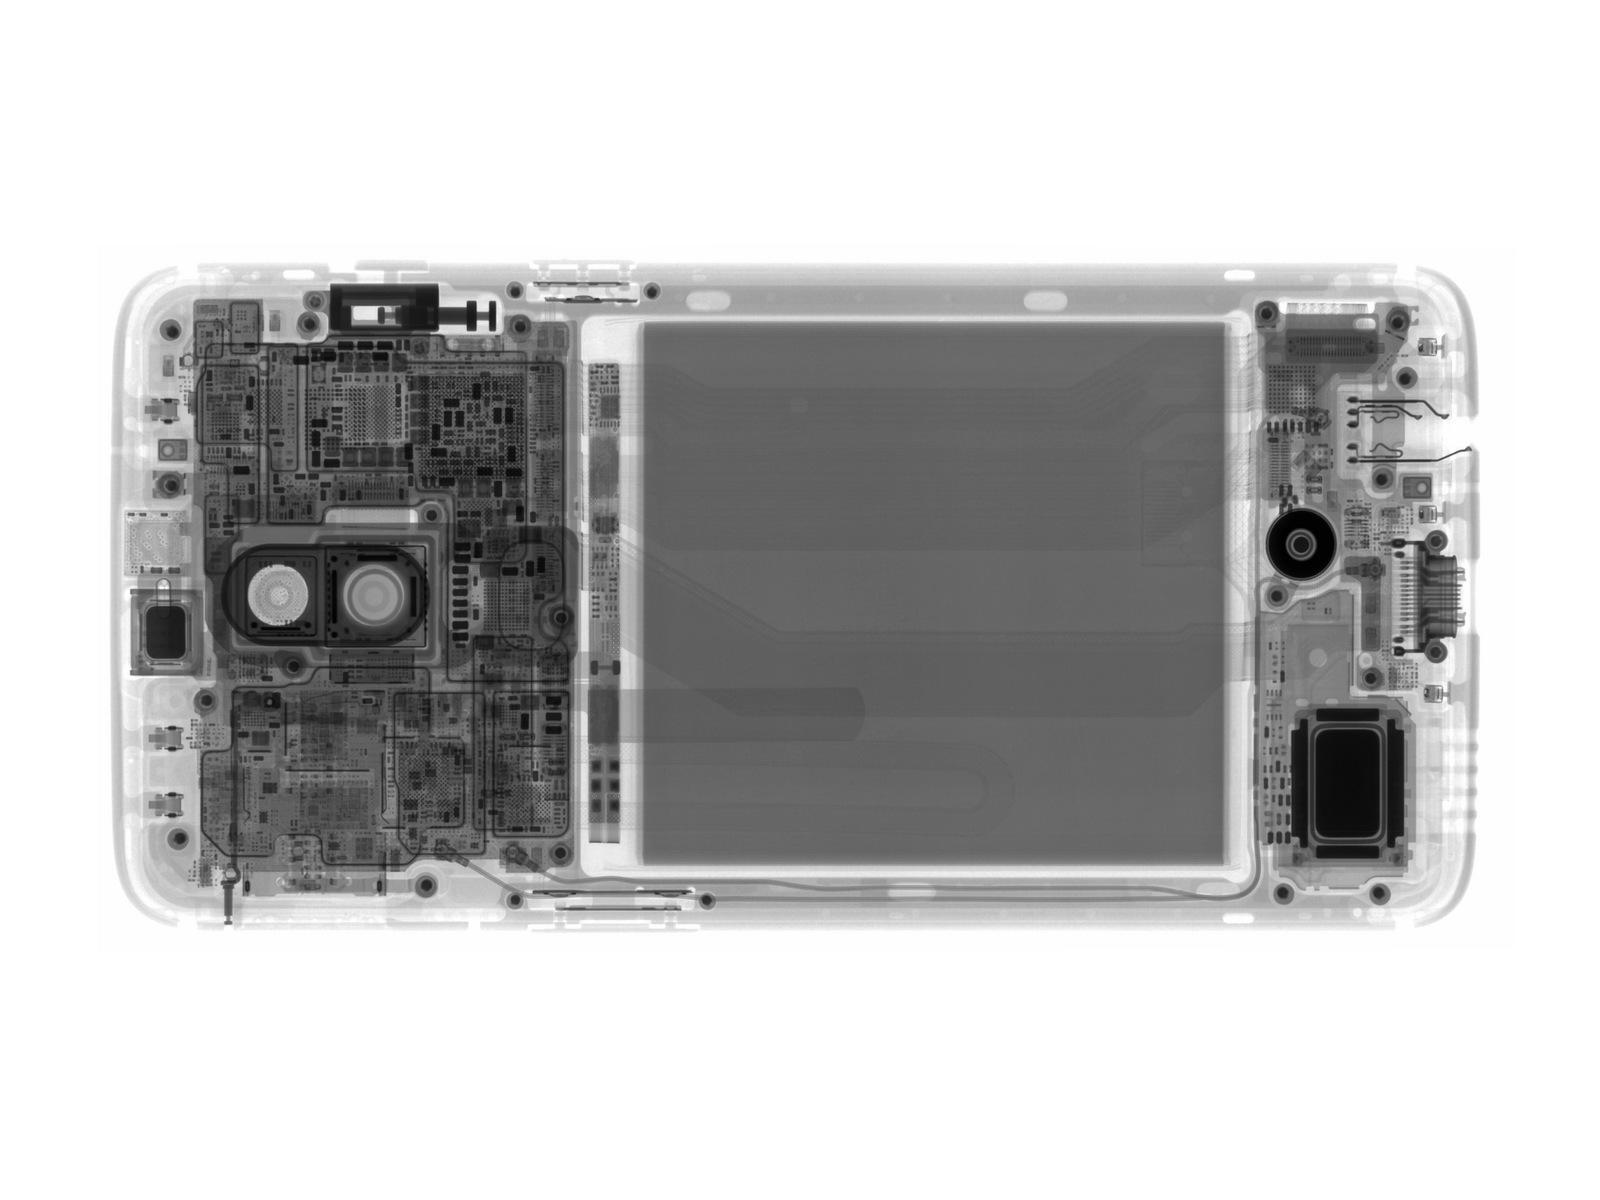 OnePlus 6 desmontado